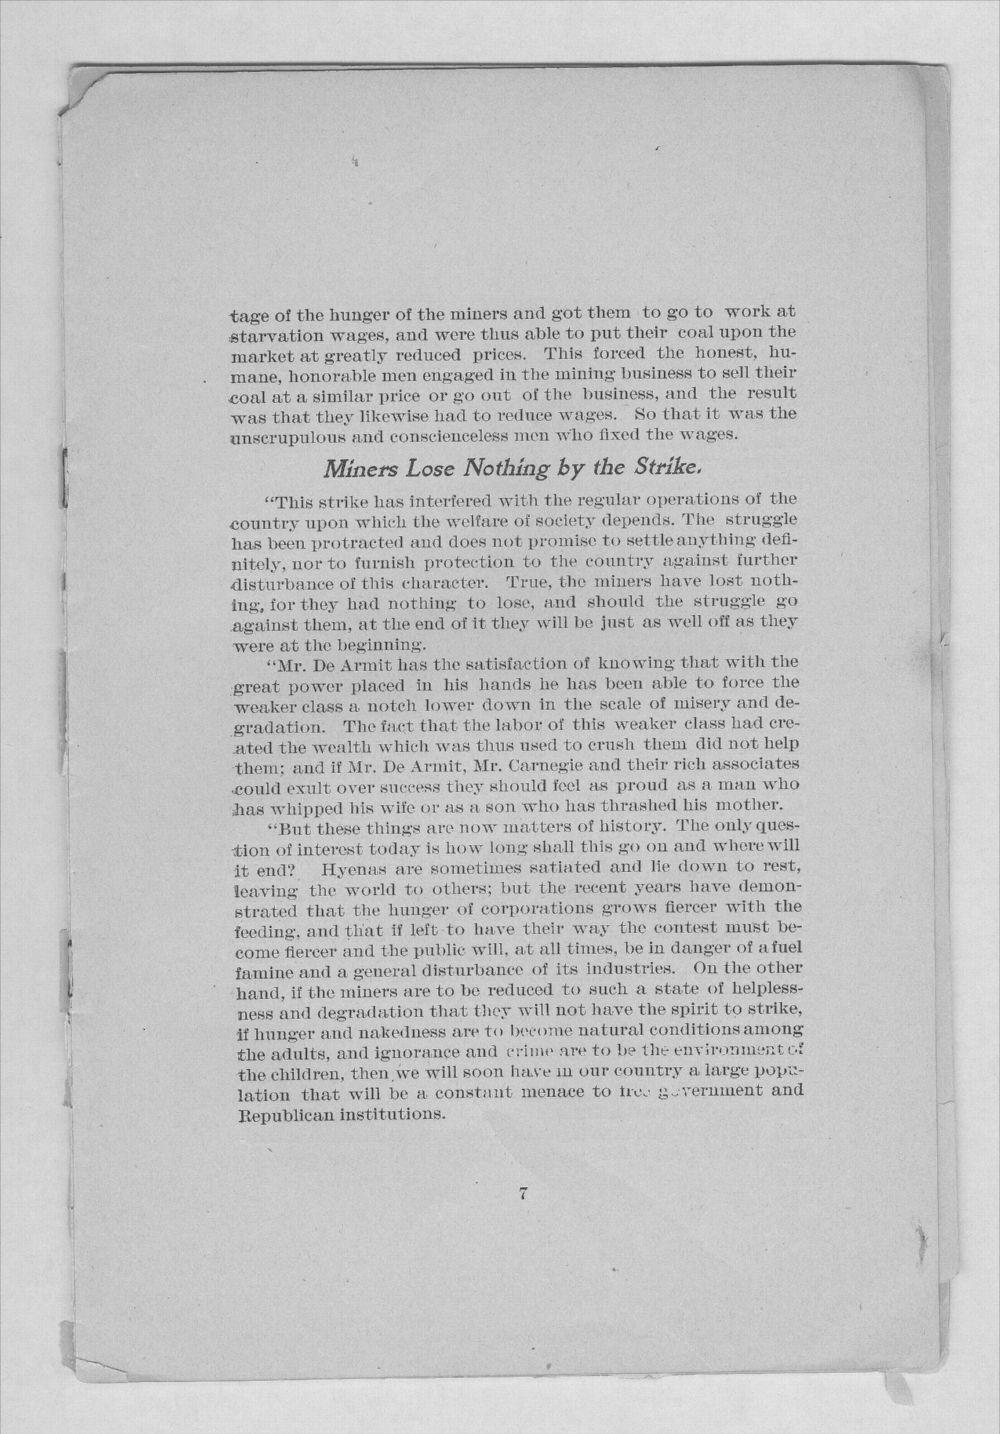 Altgeld's great speech - 7